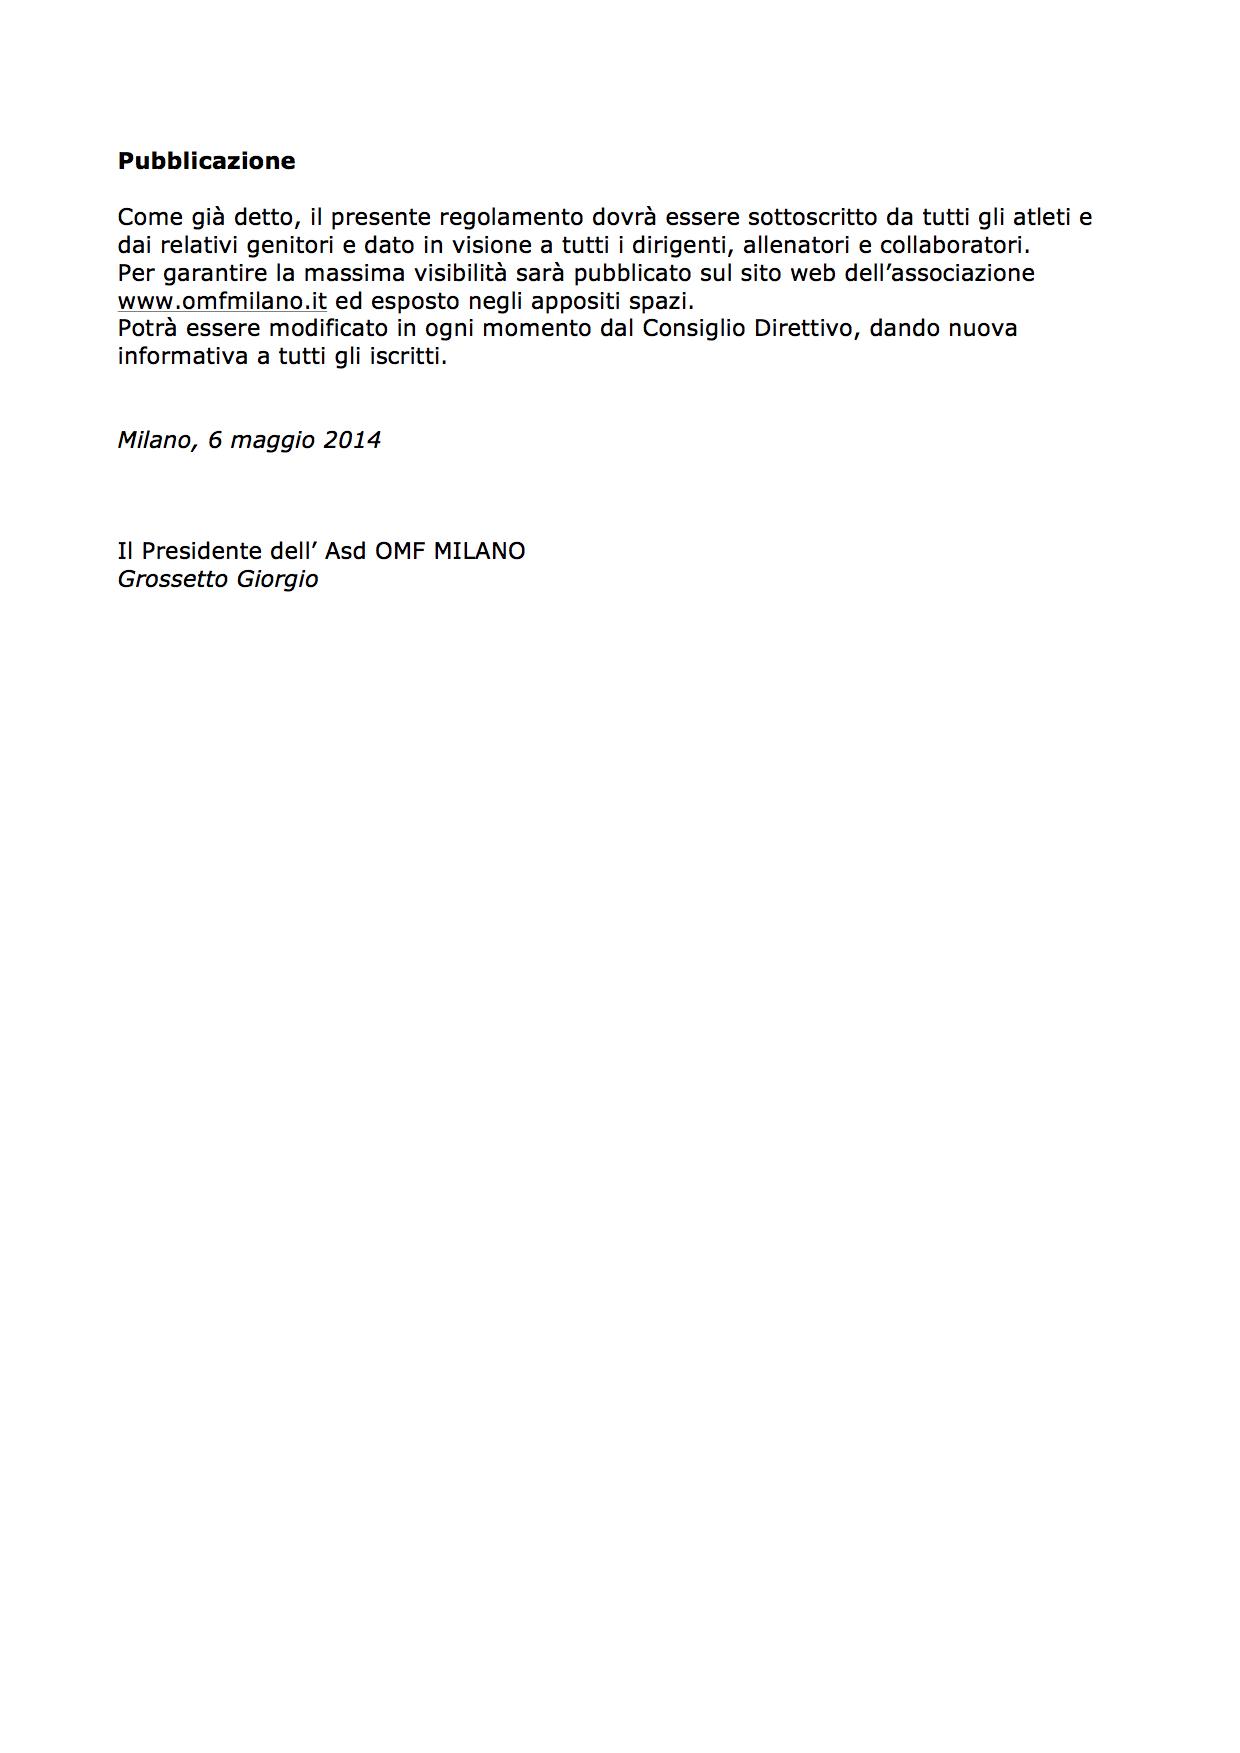 OMF - Regolamento interno 4